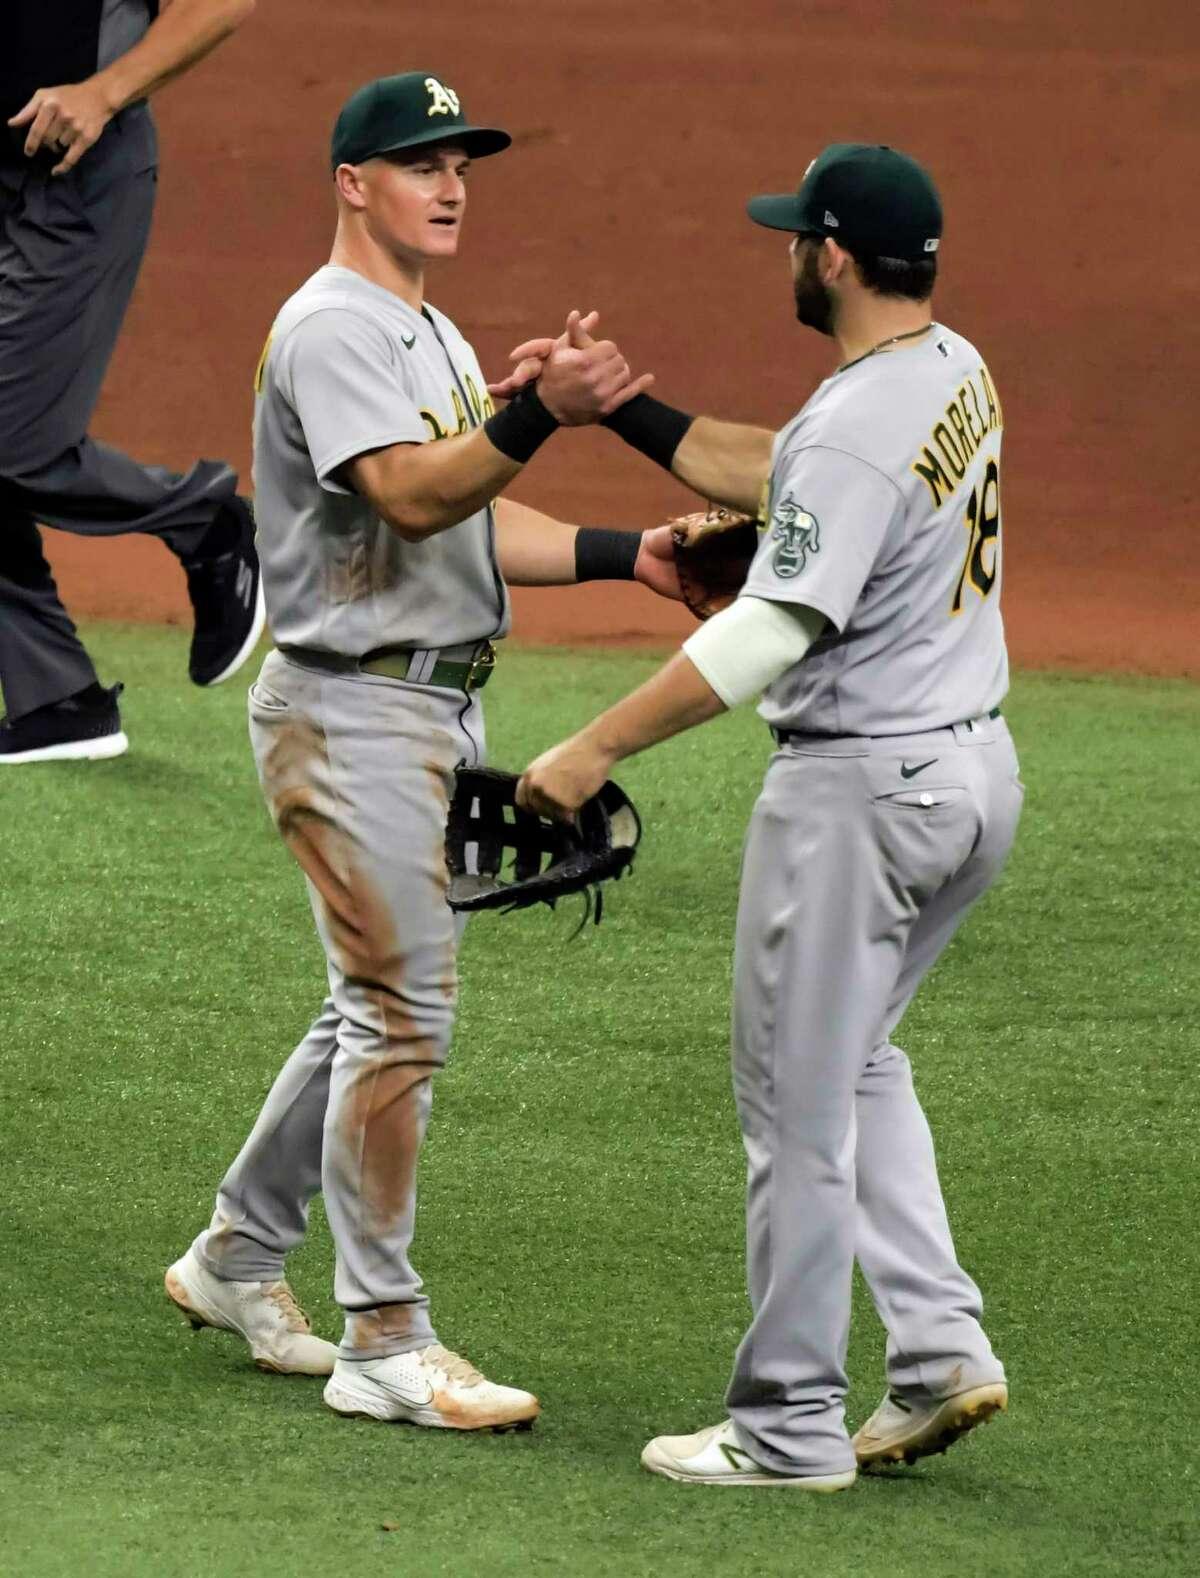 Corner infielders Matt Chapman (left) and Mitch Moreland celebrate the A's win over Tampa Bay.